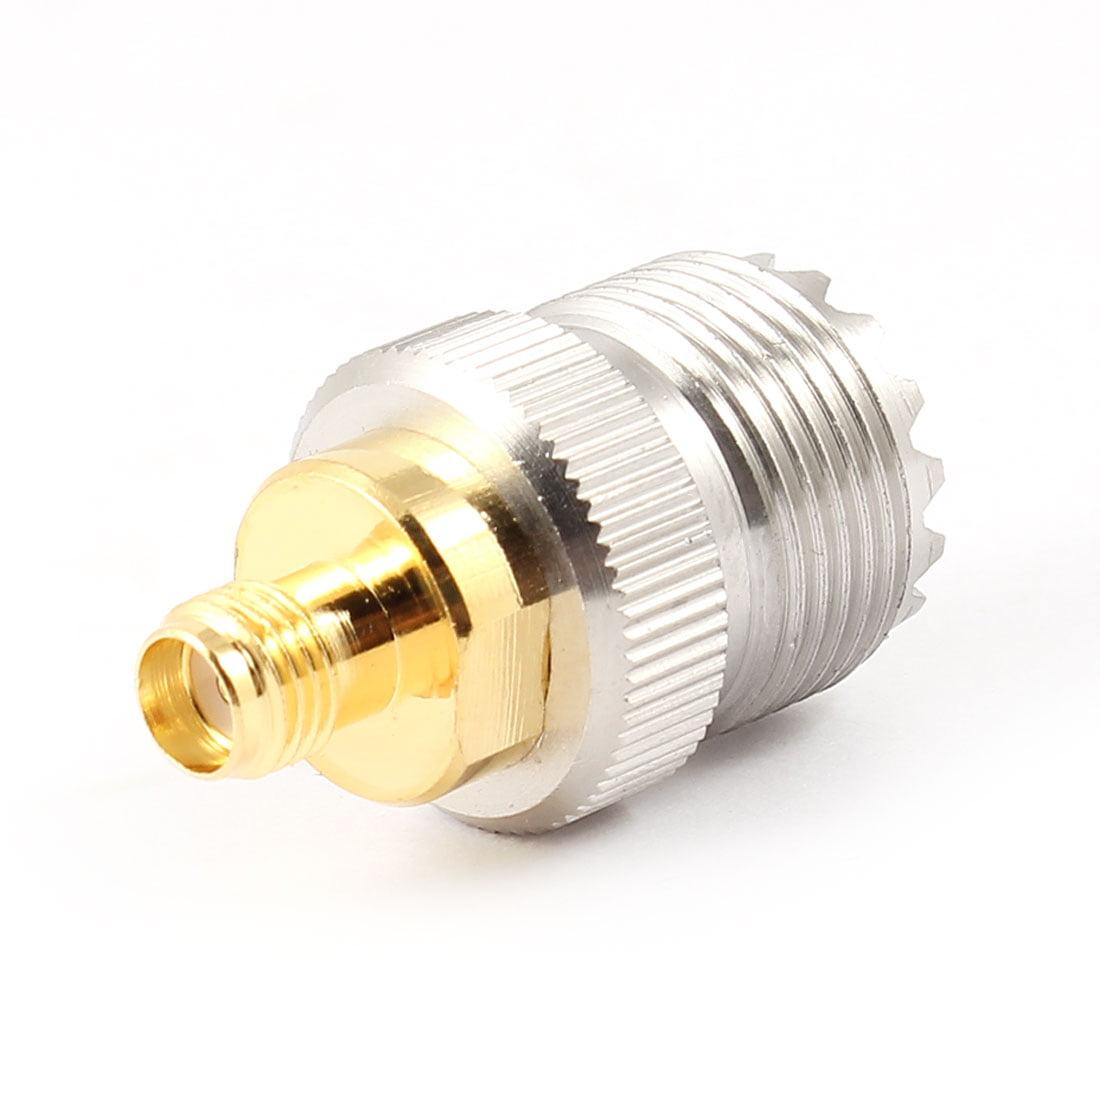 Unique Bargains UHF Female to SMA Female Plug RF Coaxial Antenna Connector